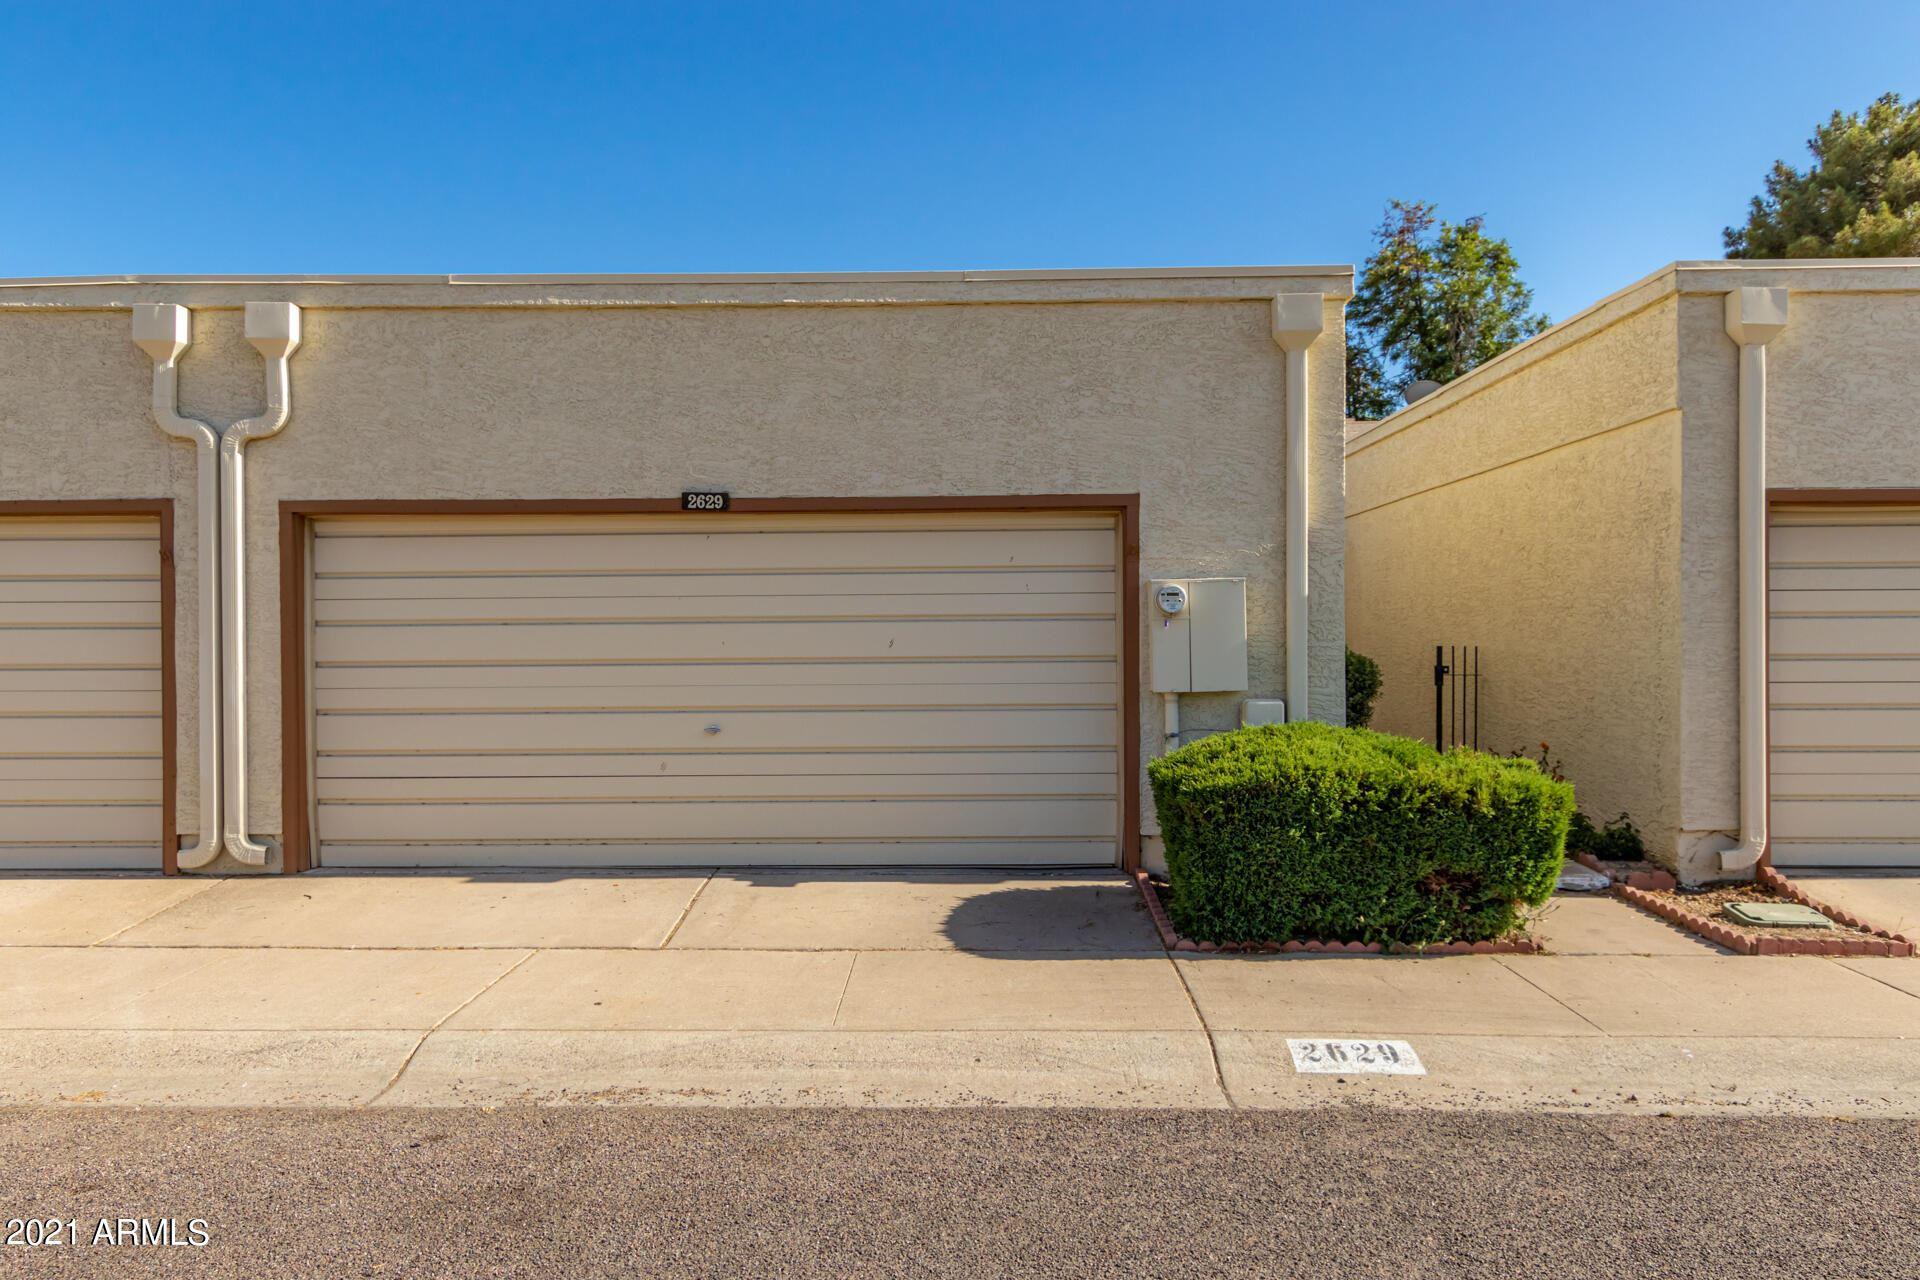 2629 W PERSHING Avenue, Phoenix, AZ 85029 - MLS#: 6235357